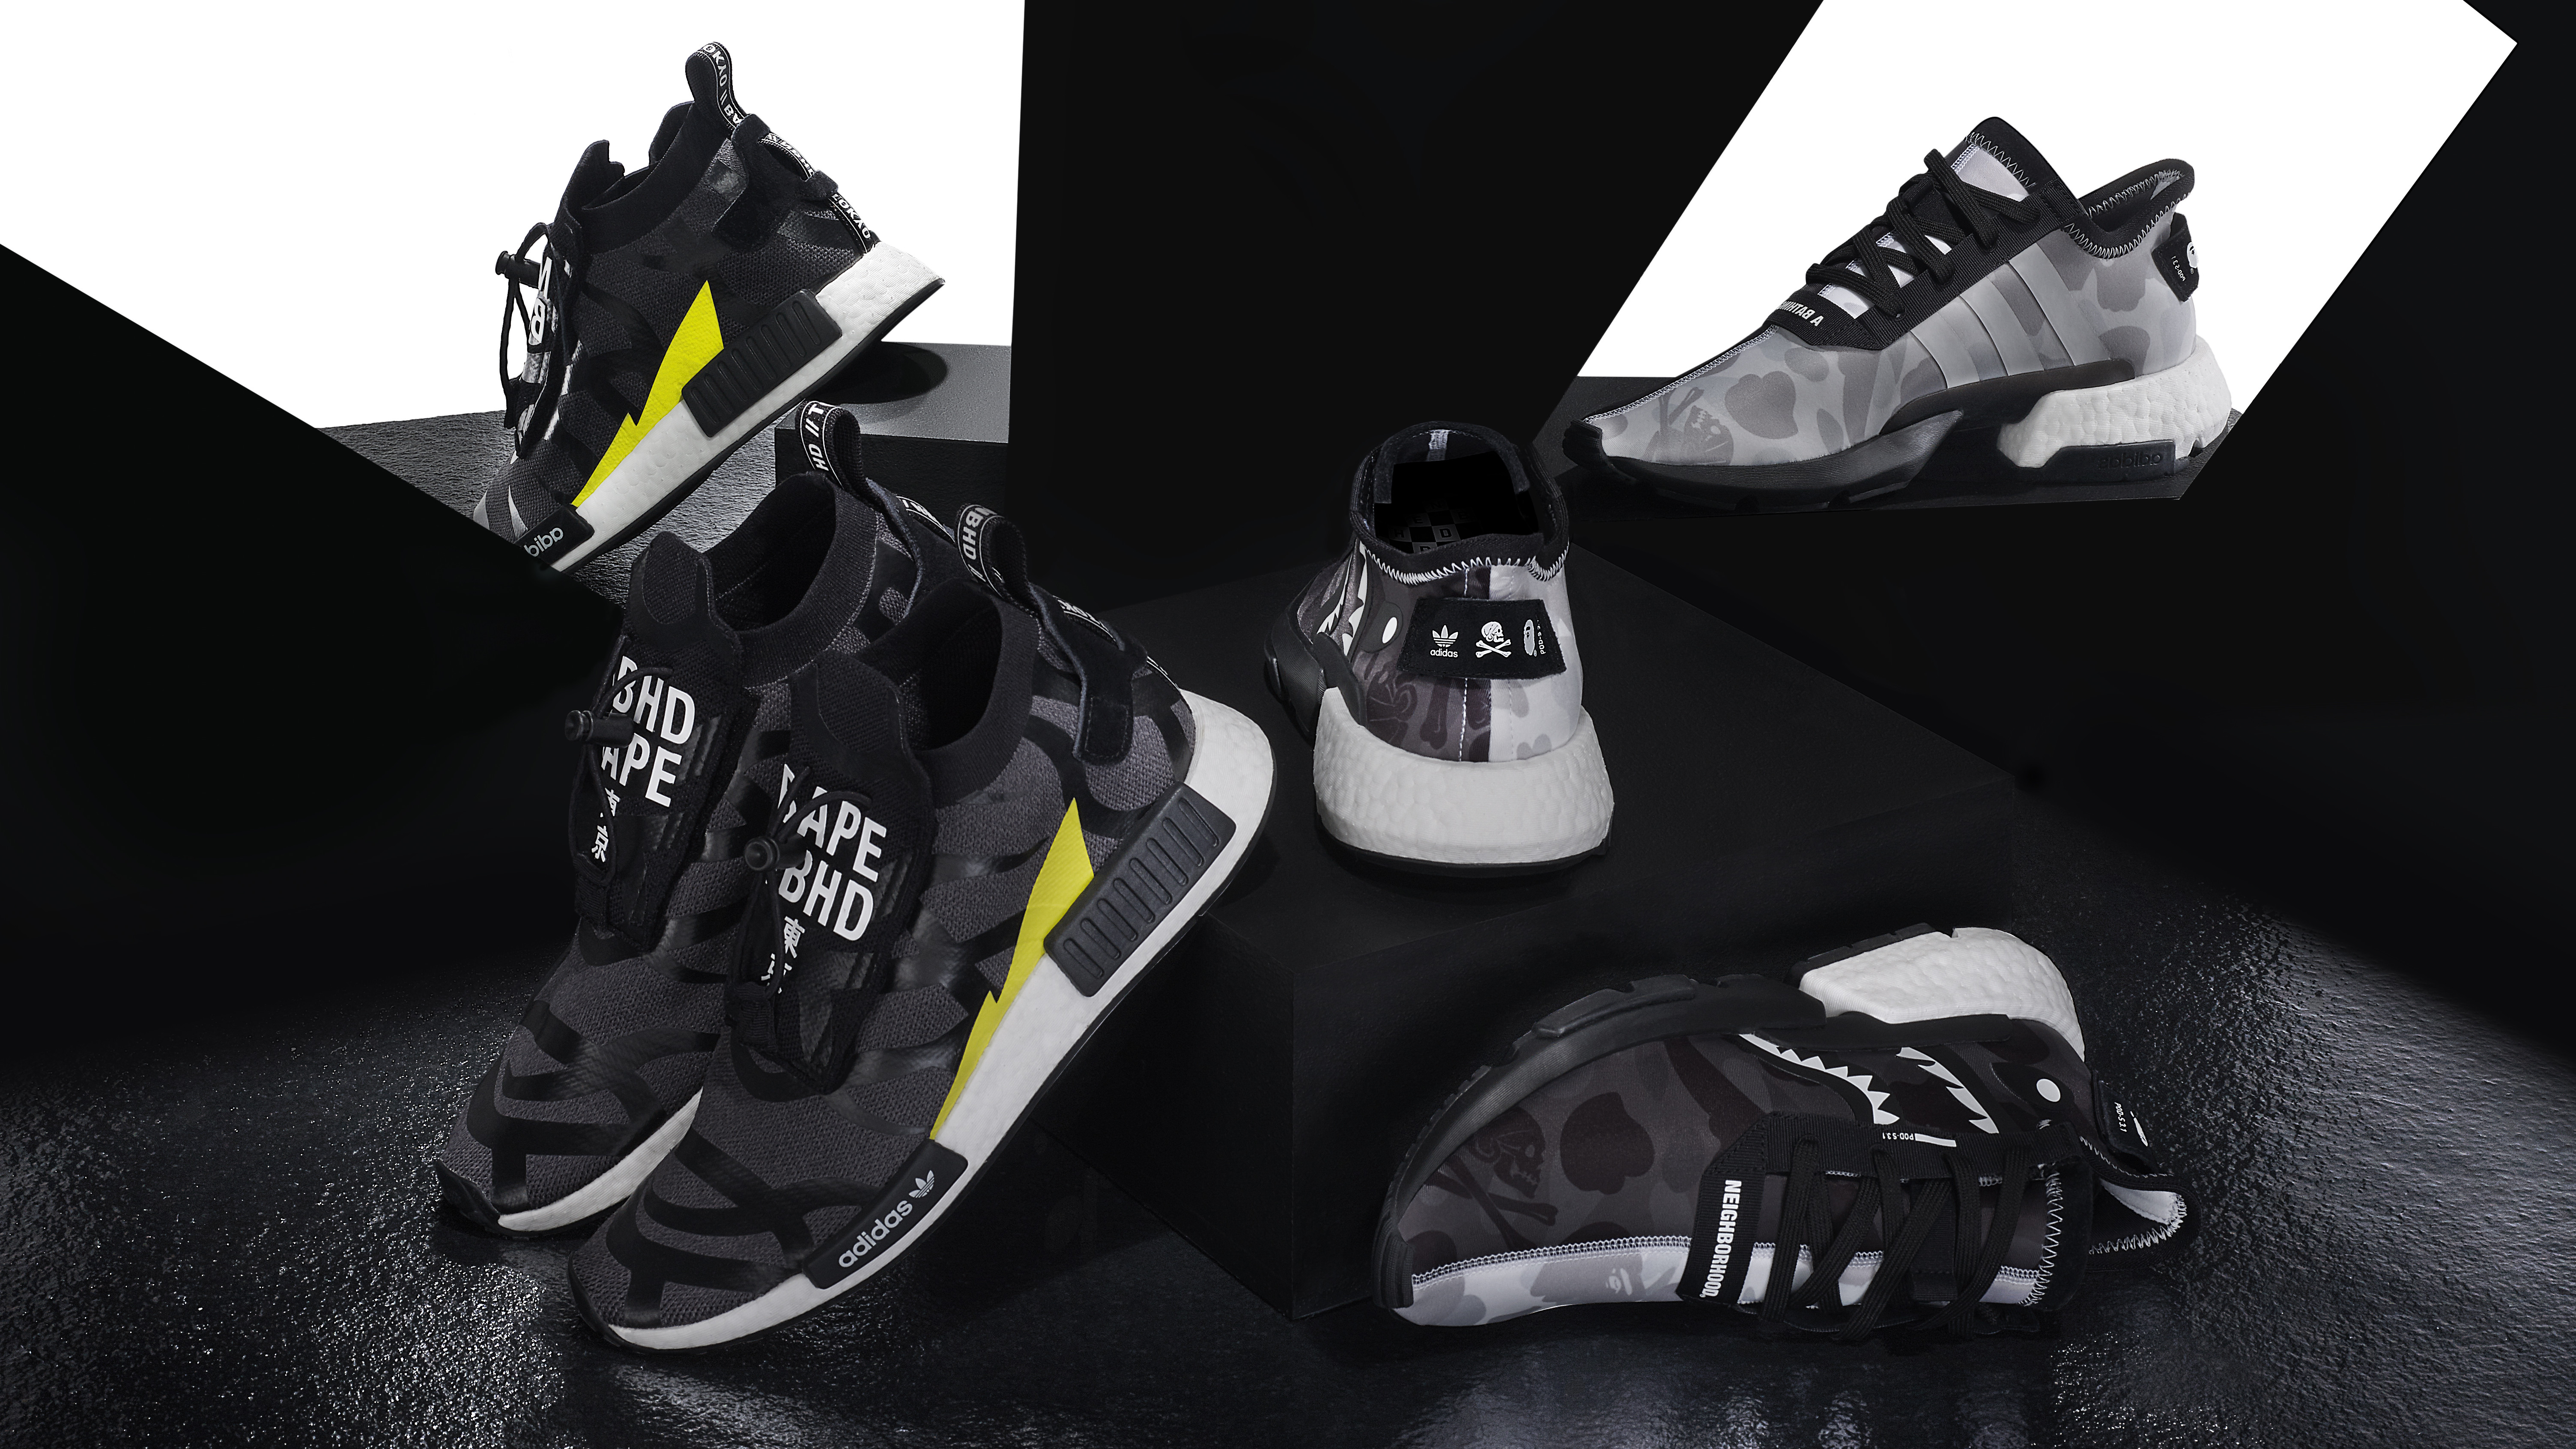 17cbe2162 Bape x Neighborhood x Adidas POD 3.1 EE9431 NMD STLT EE9702 Release Date